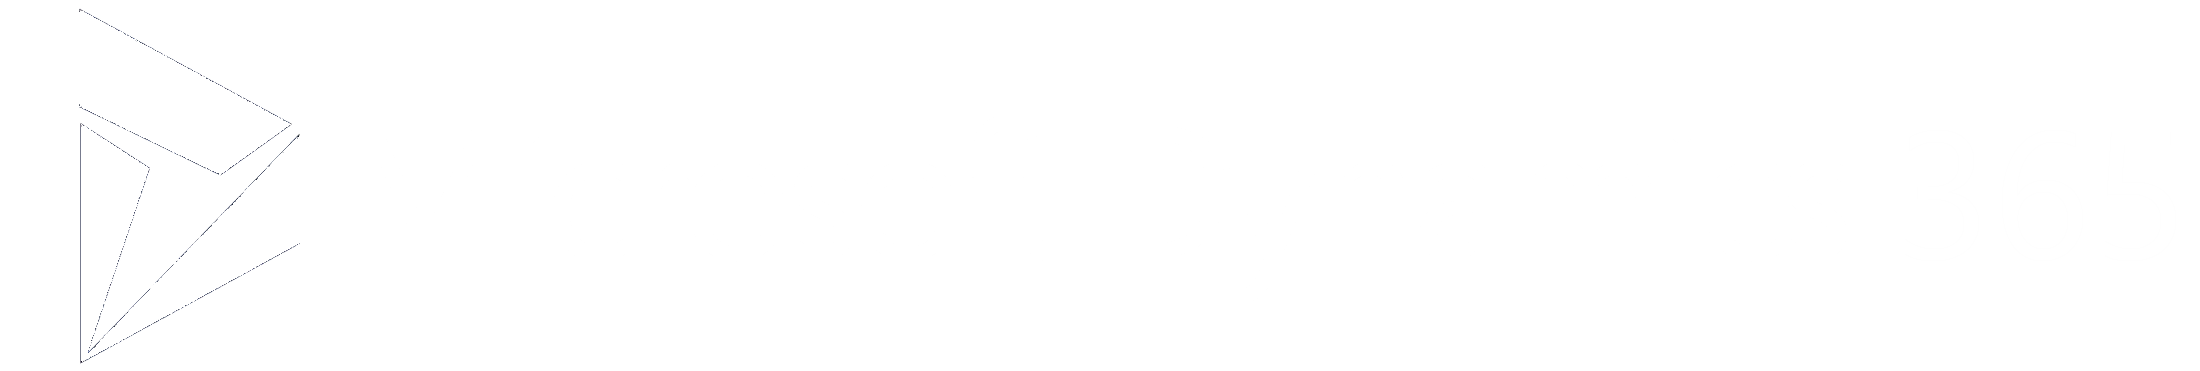 dynamics-365-logo-custom2-white-trans